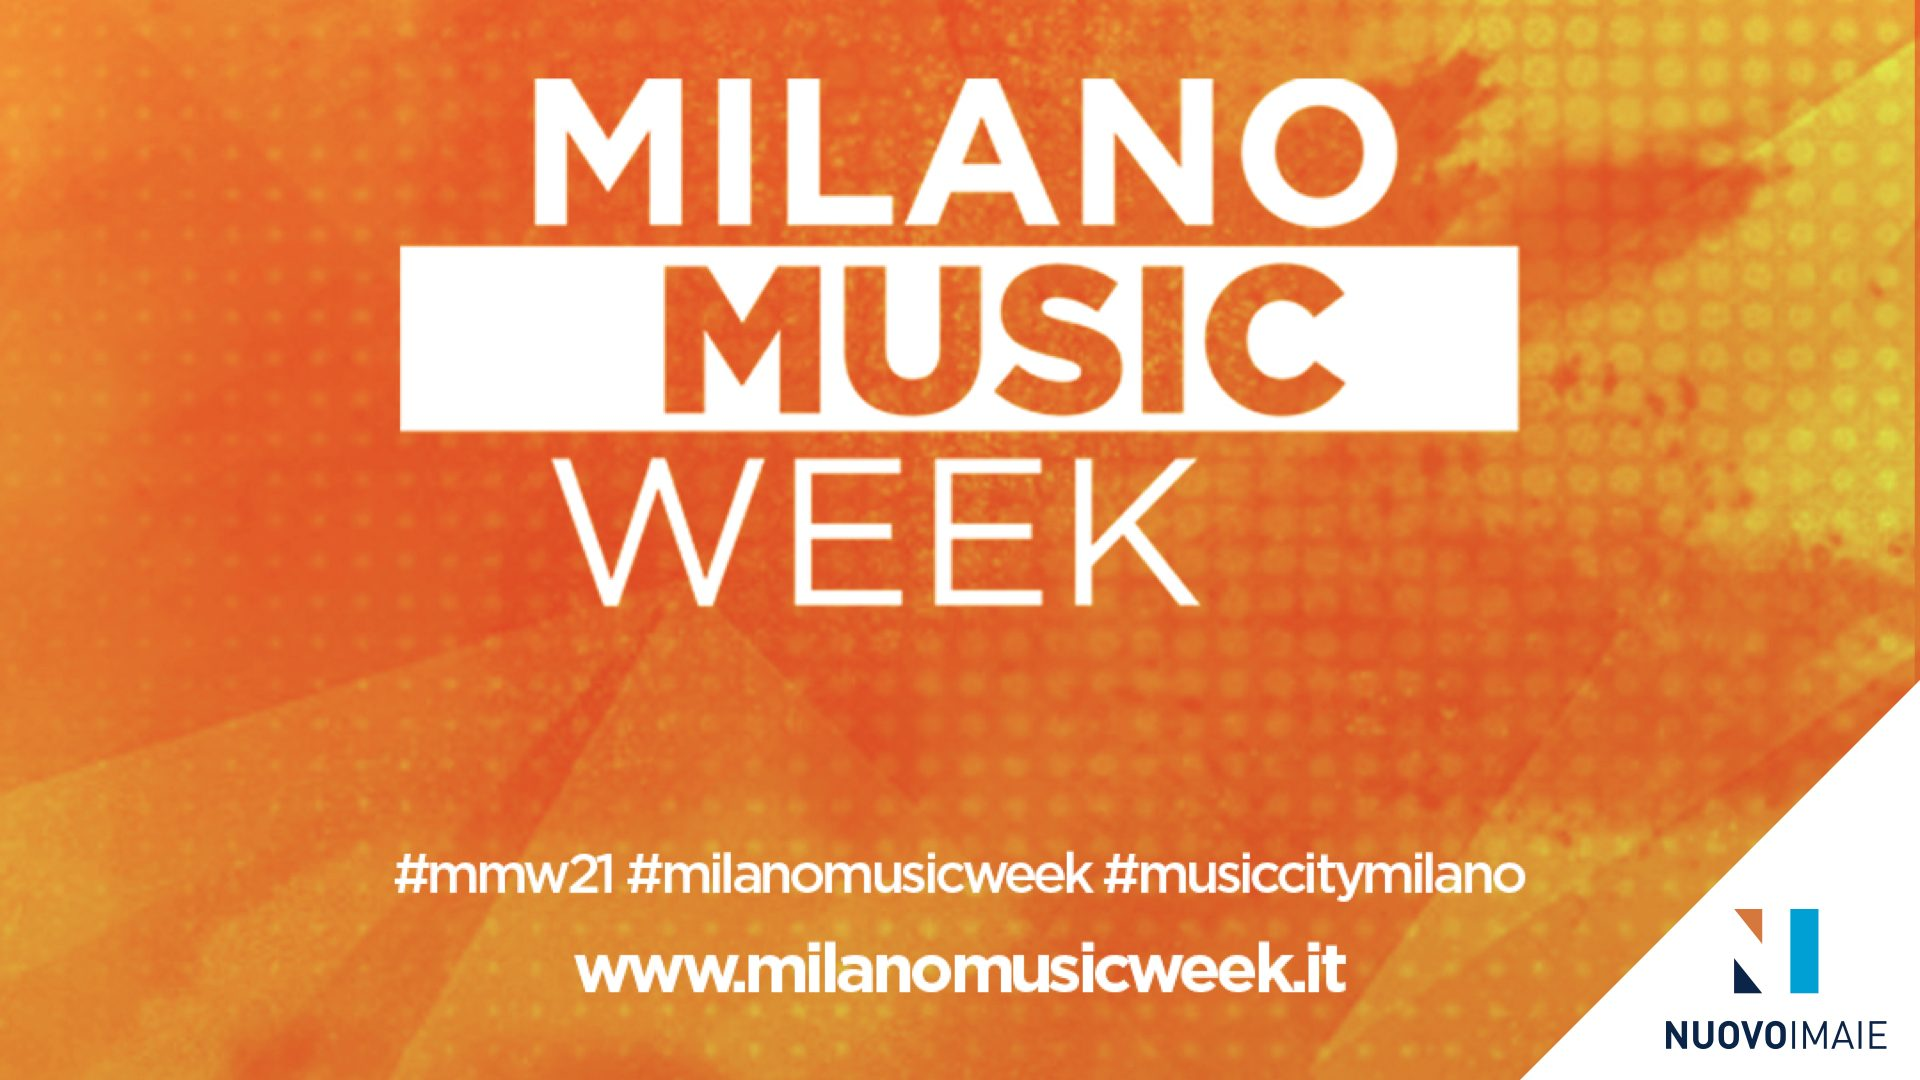 NUOVO IMAIE tra i promotori della Milano Music Week 2021